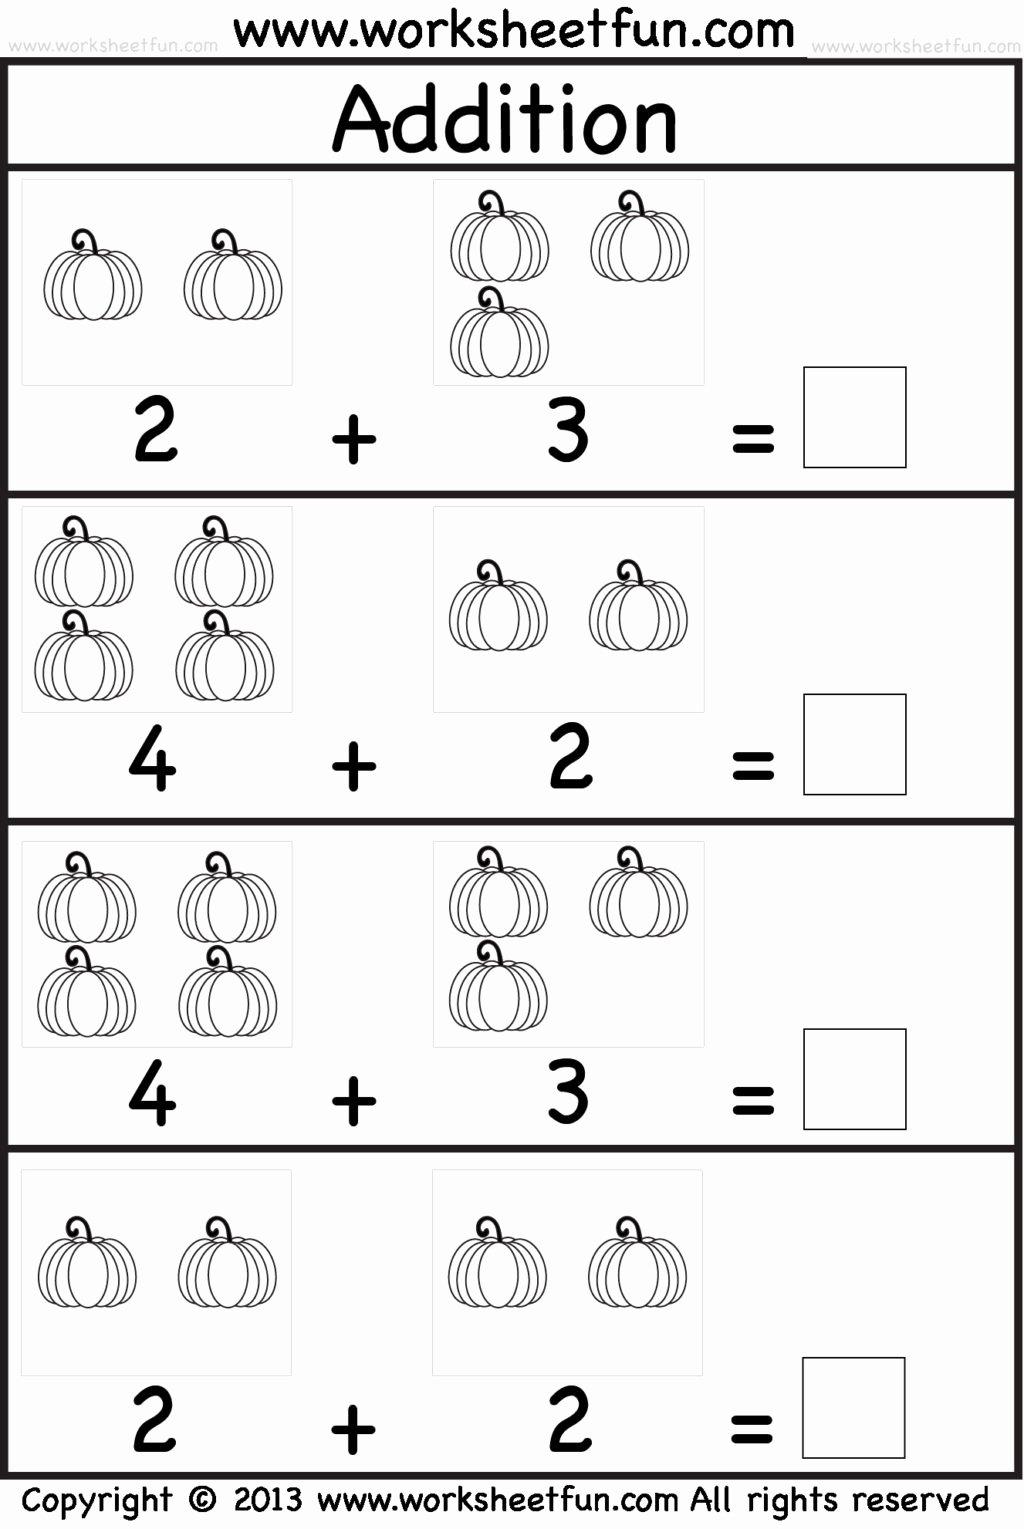 Math Worksheets for Preschoolers Printables Fresh Worksheet Math Worksheets Preschool Free Printable